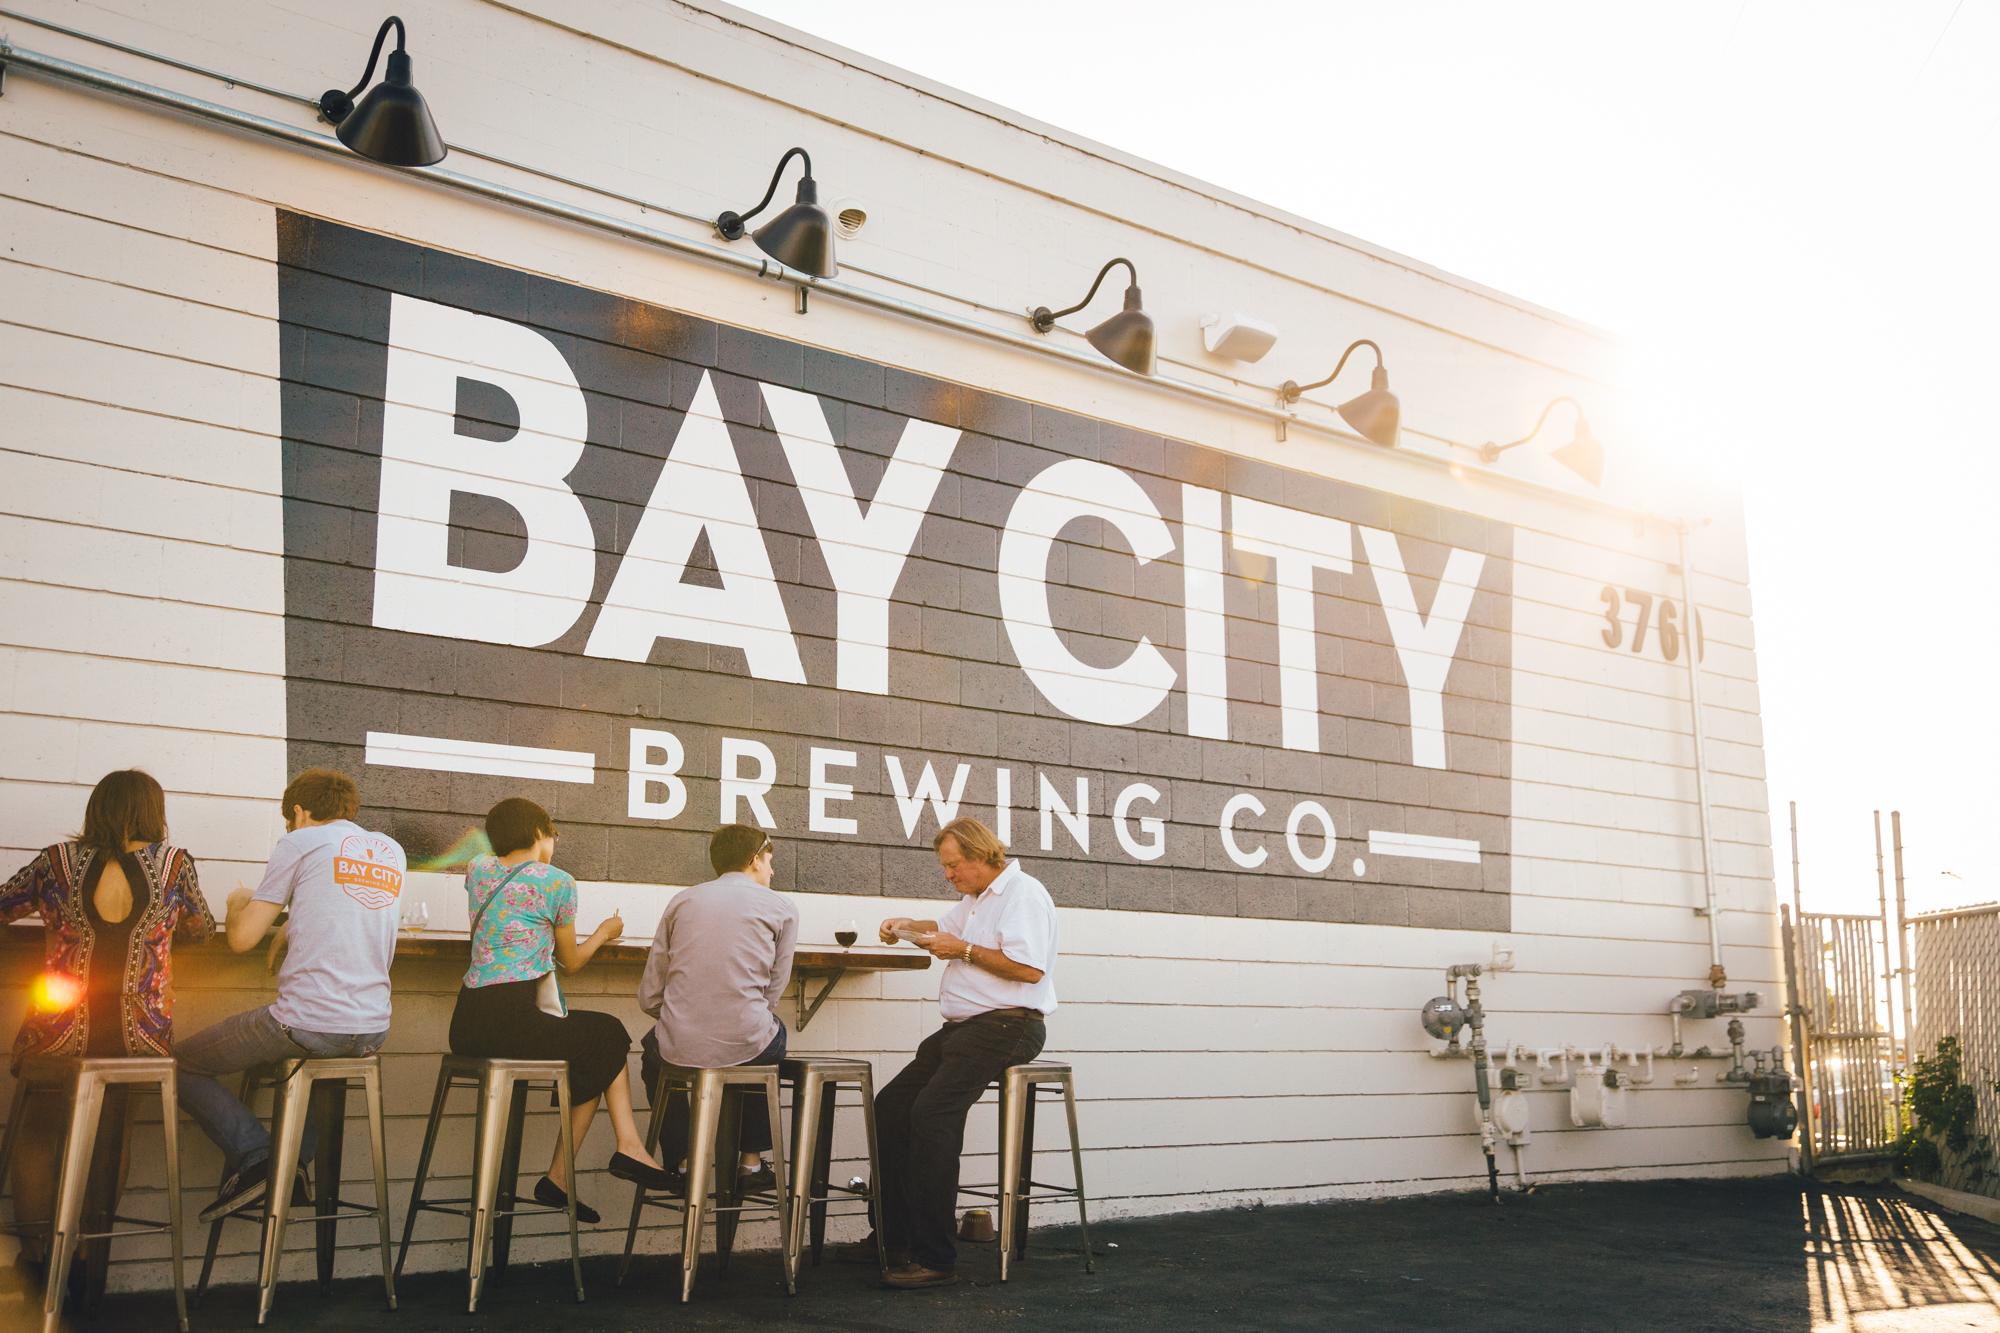 bay city-128.JPG